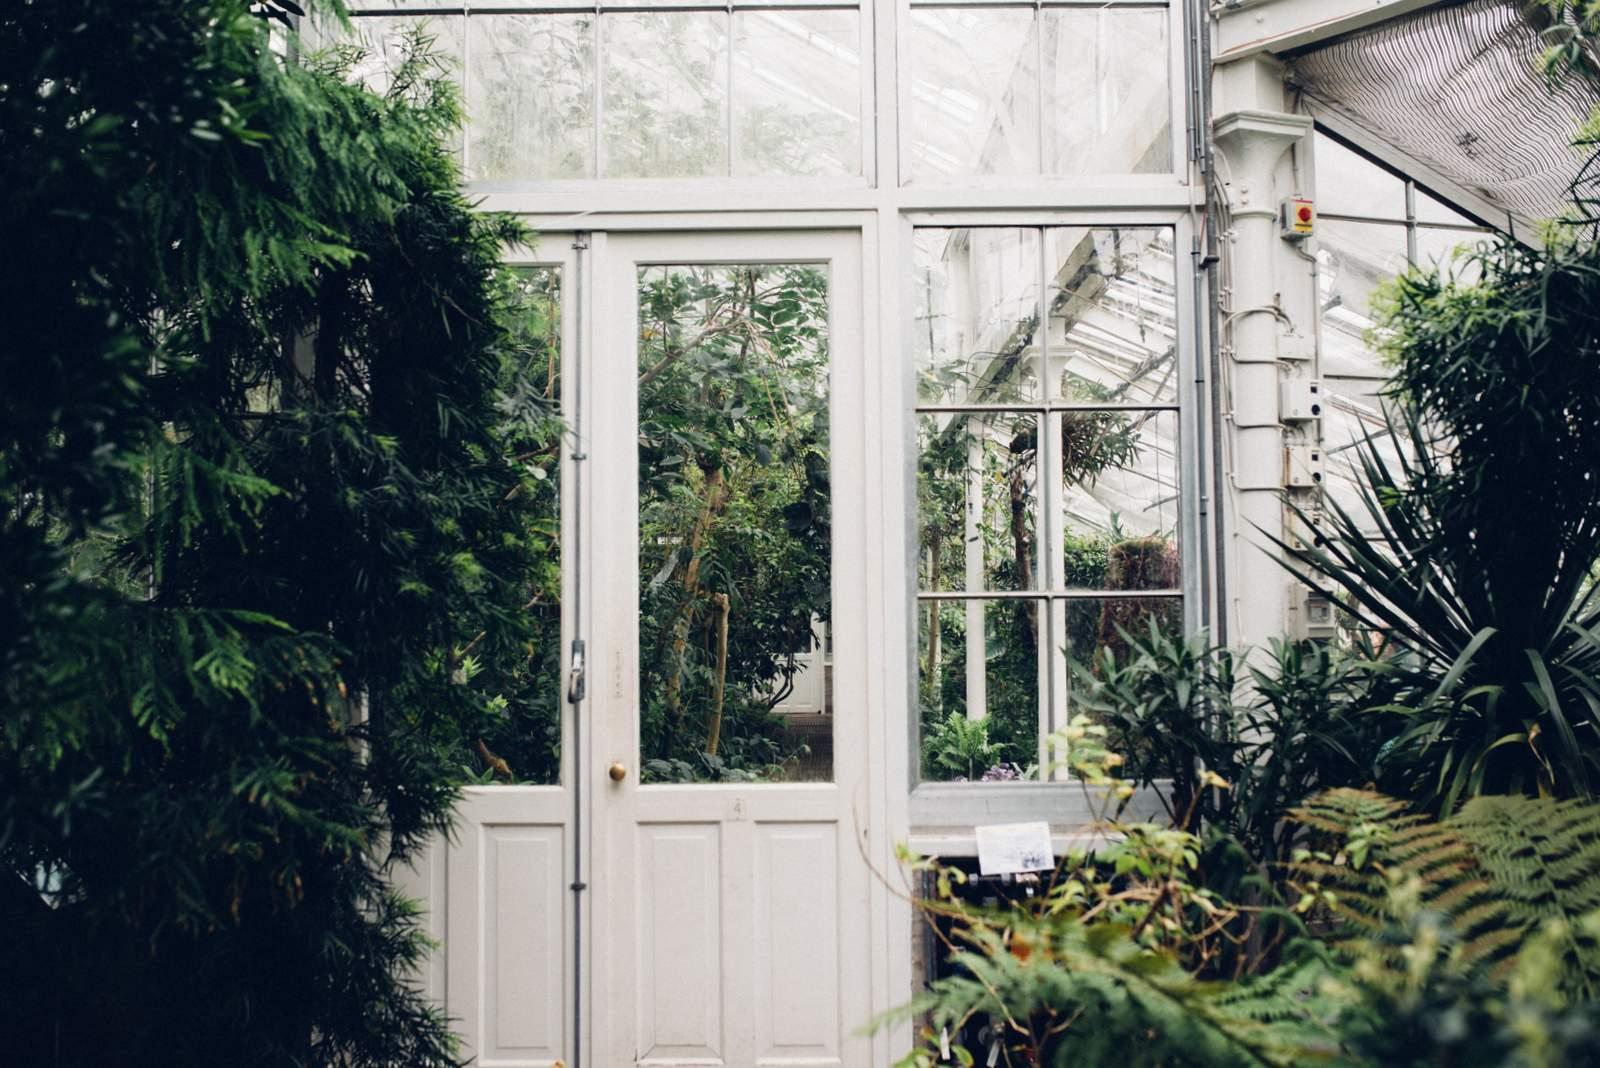 copenhagen-botanical-gardens-house-of-valentina-4